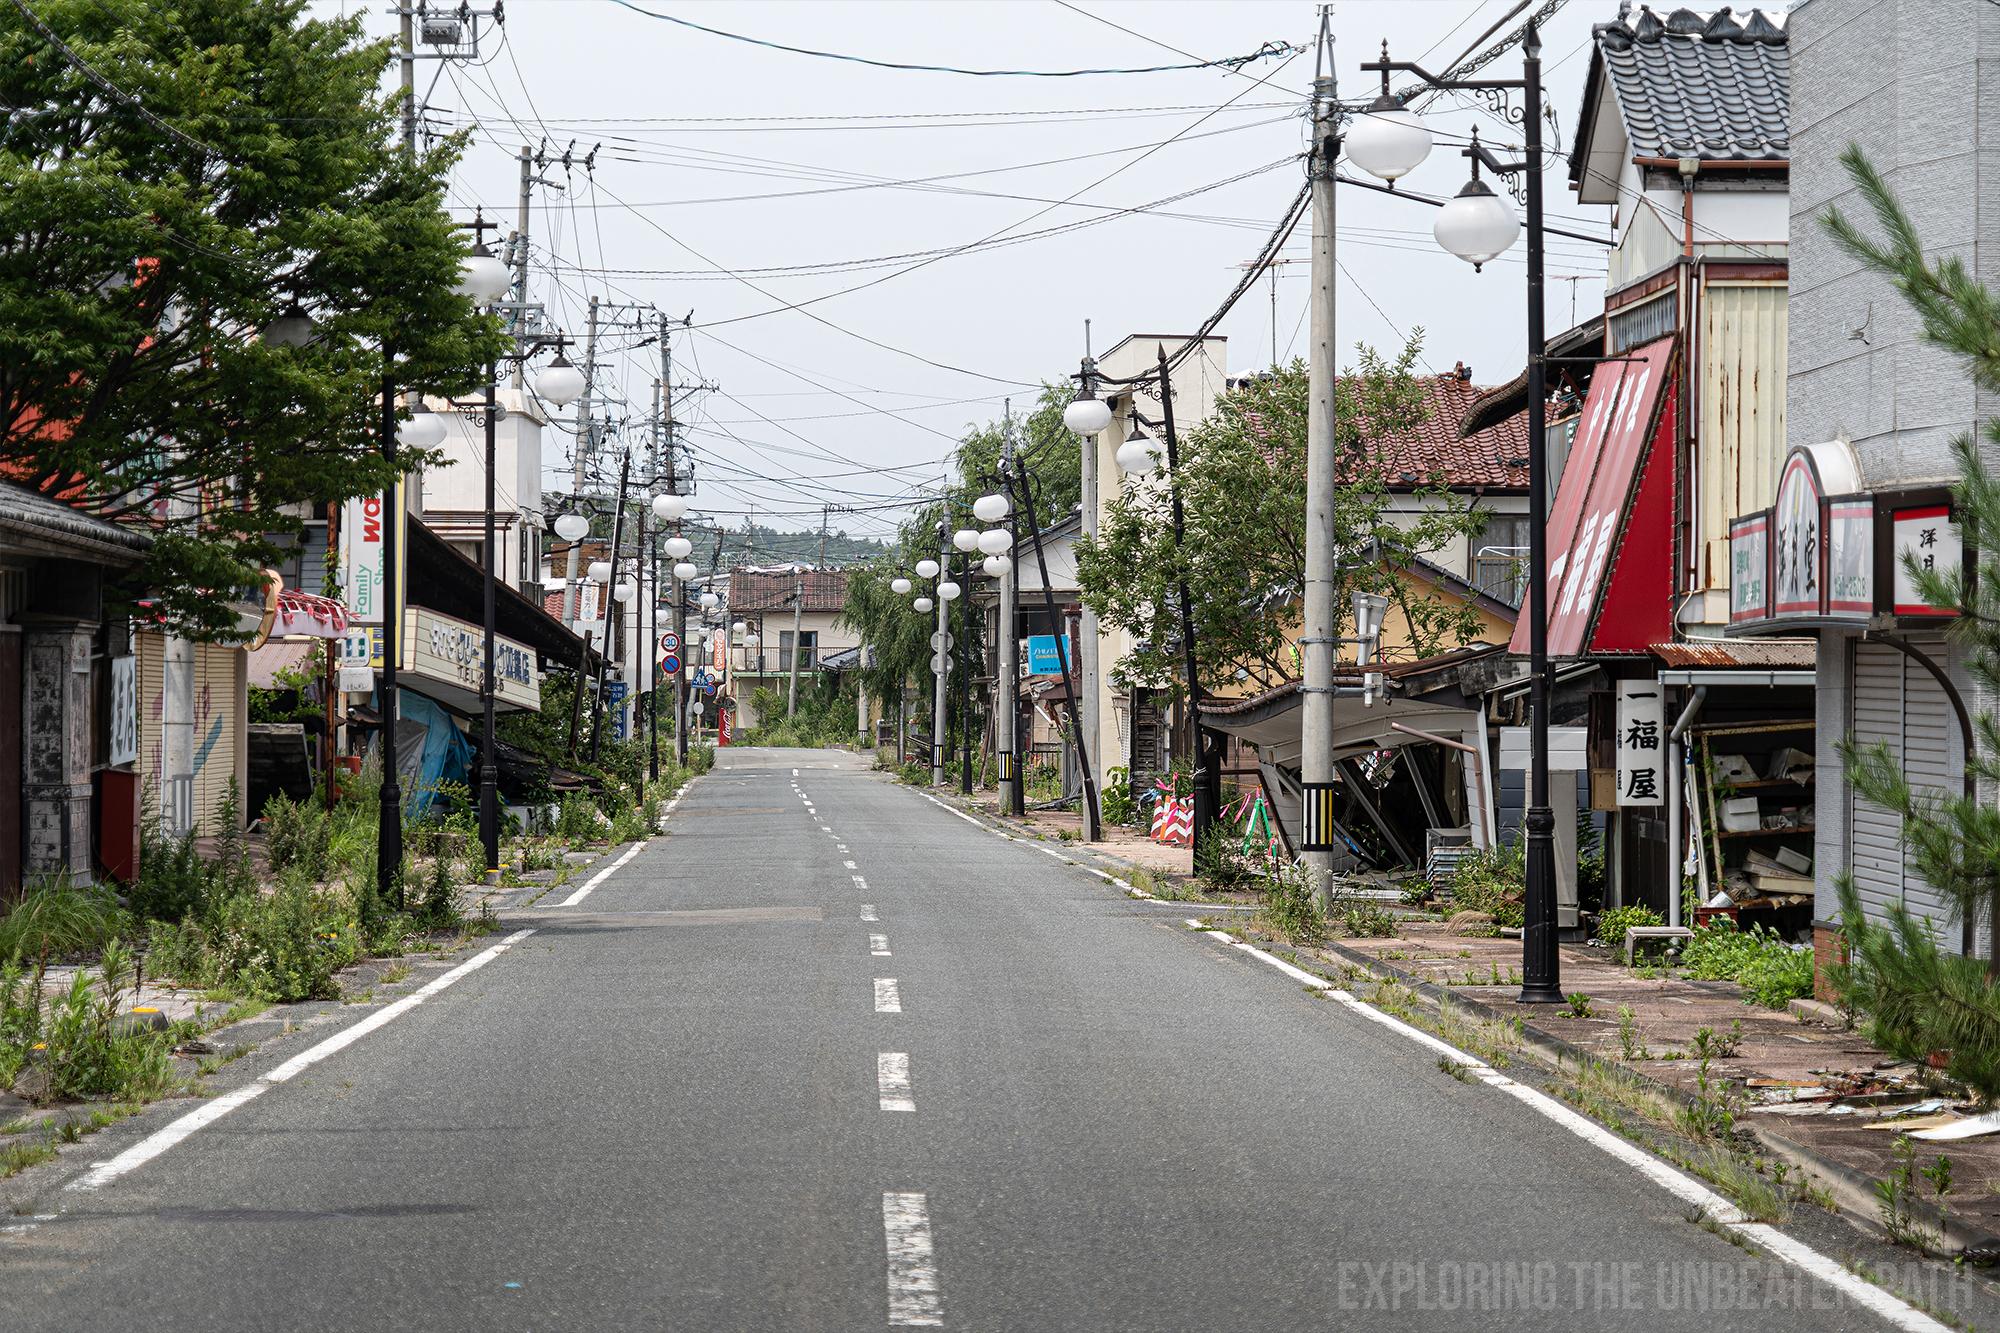 Fukushima Exclusion zone abandoned urbex urban exploring radioactive